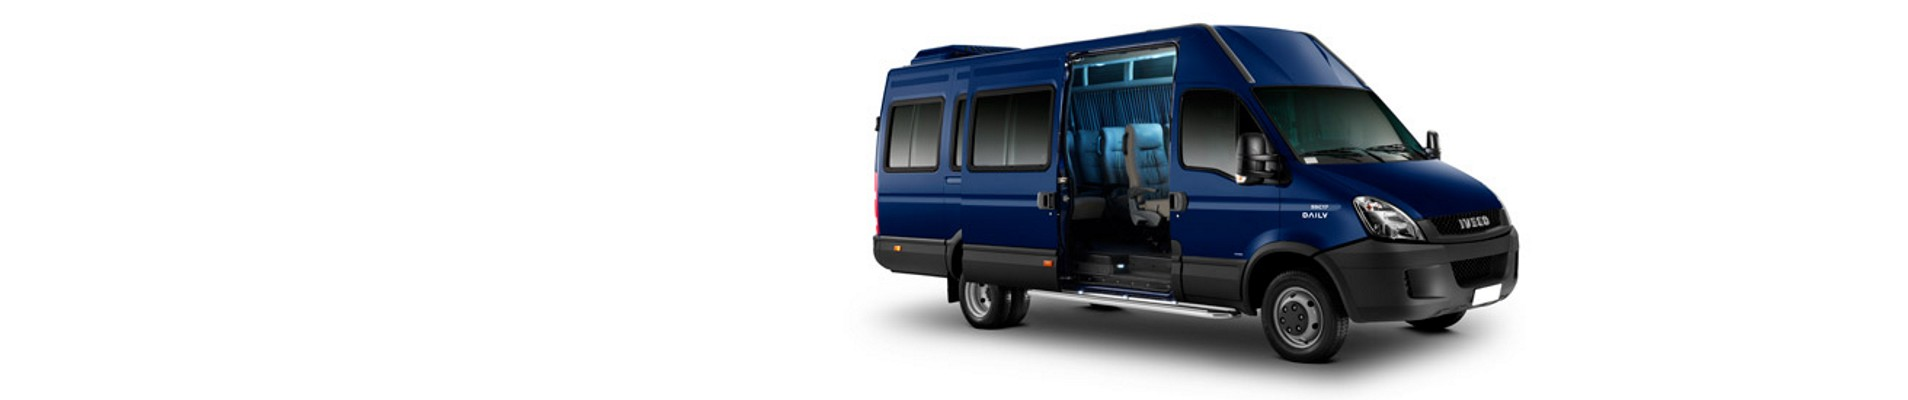 minibus hire & coach hire derby nottingham leicester staffordshire